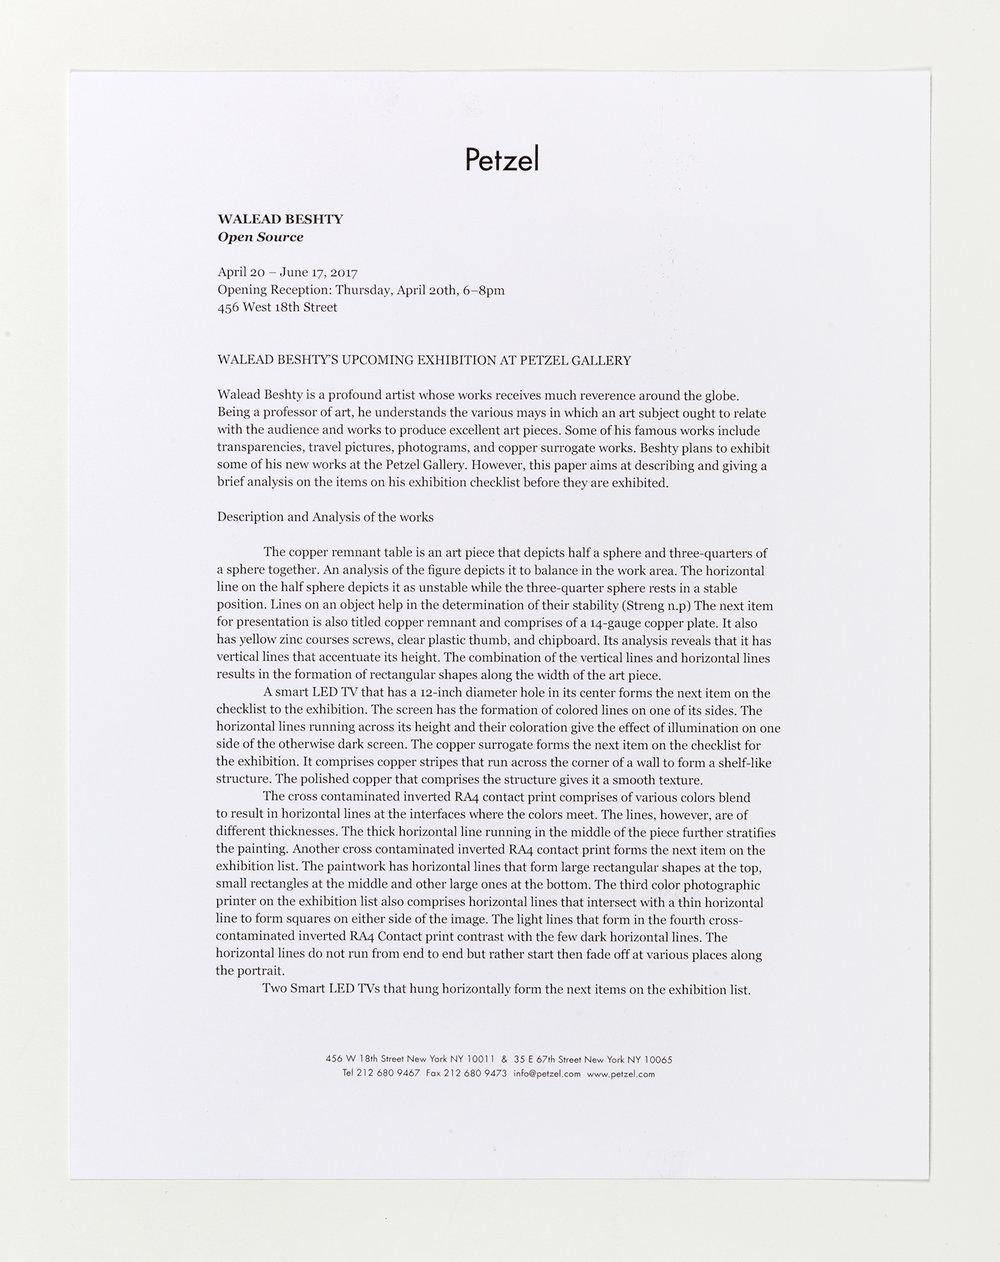 Open Source press release   Petzel Gallery  New York  New York  2017